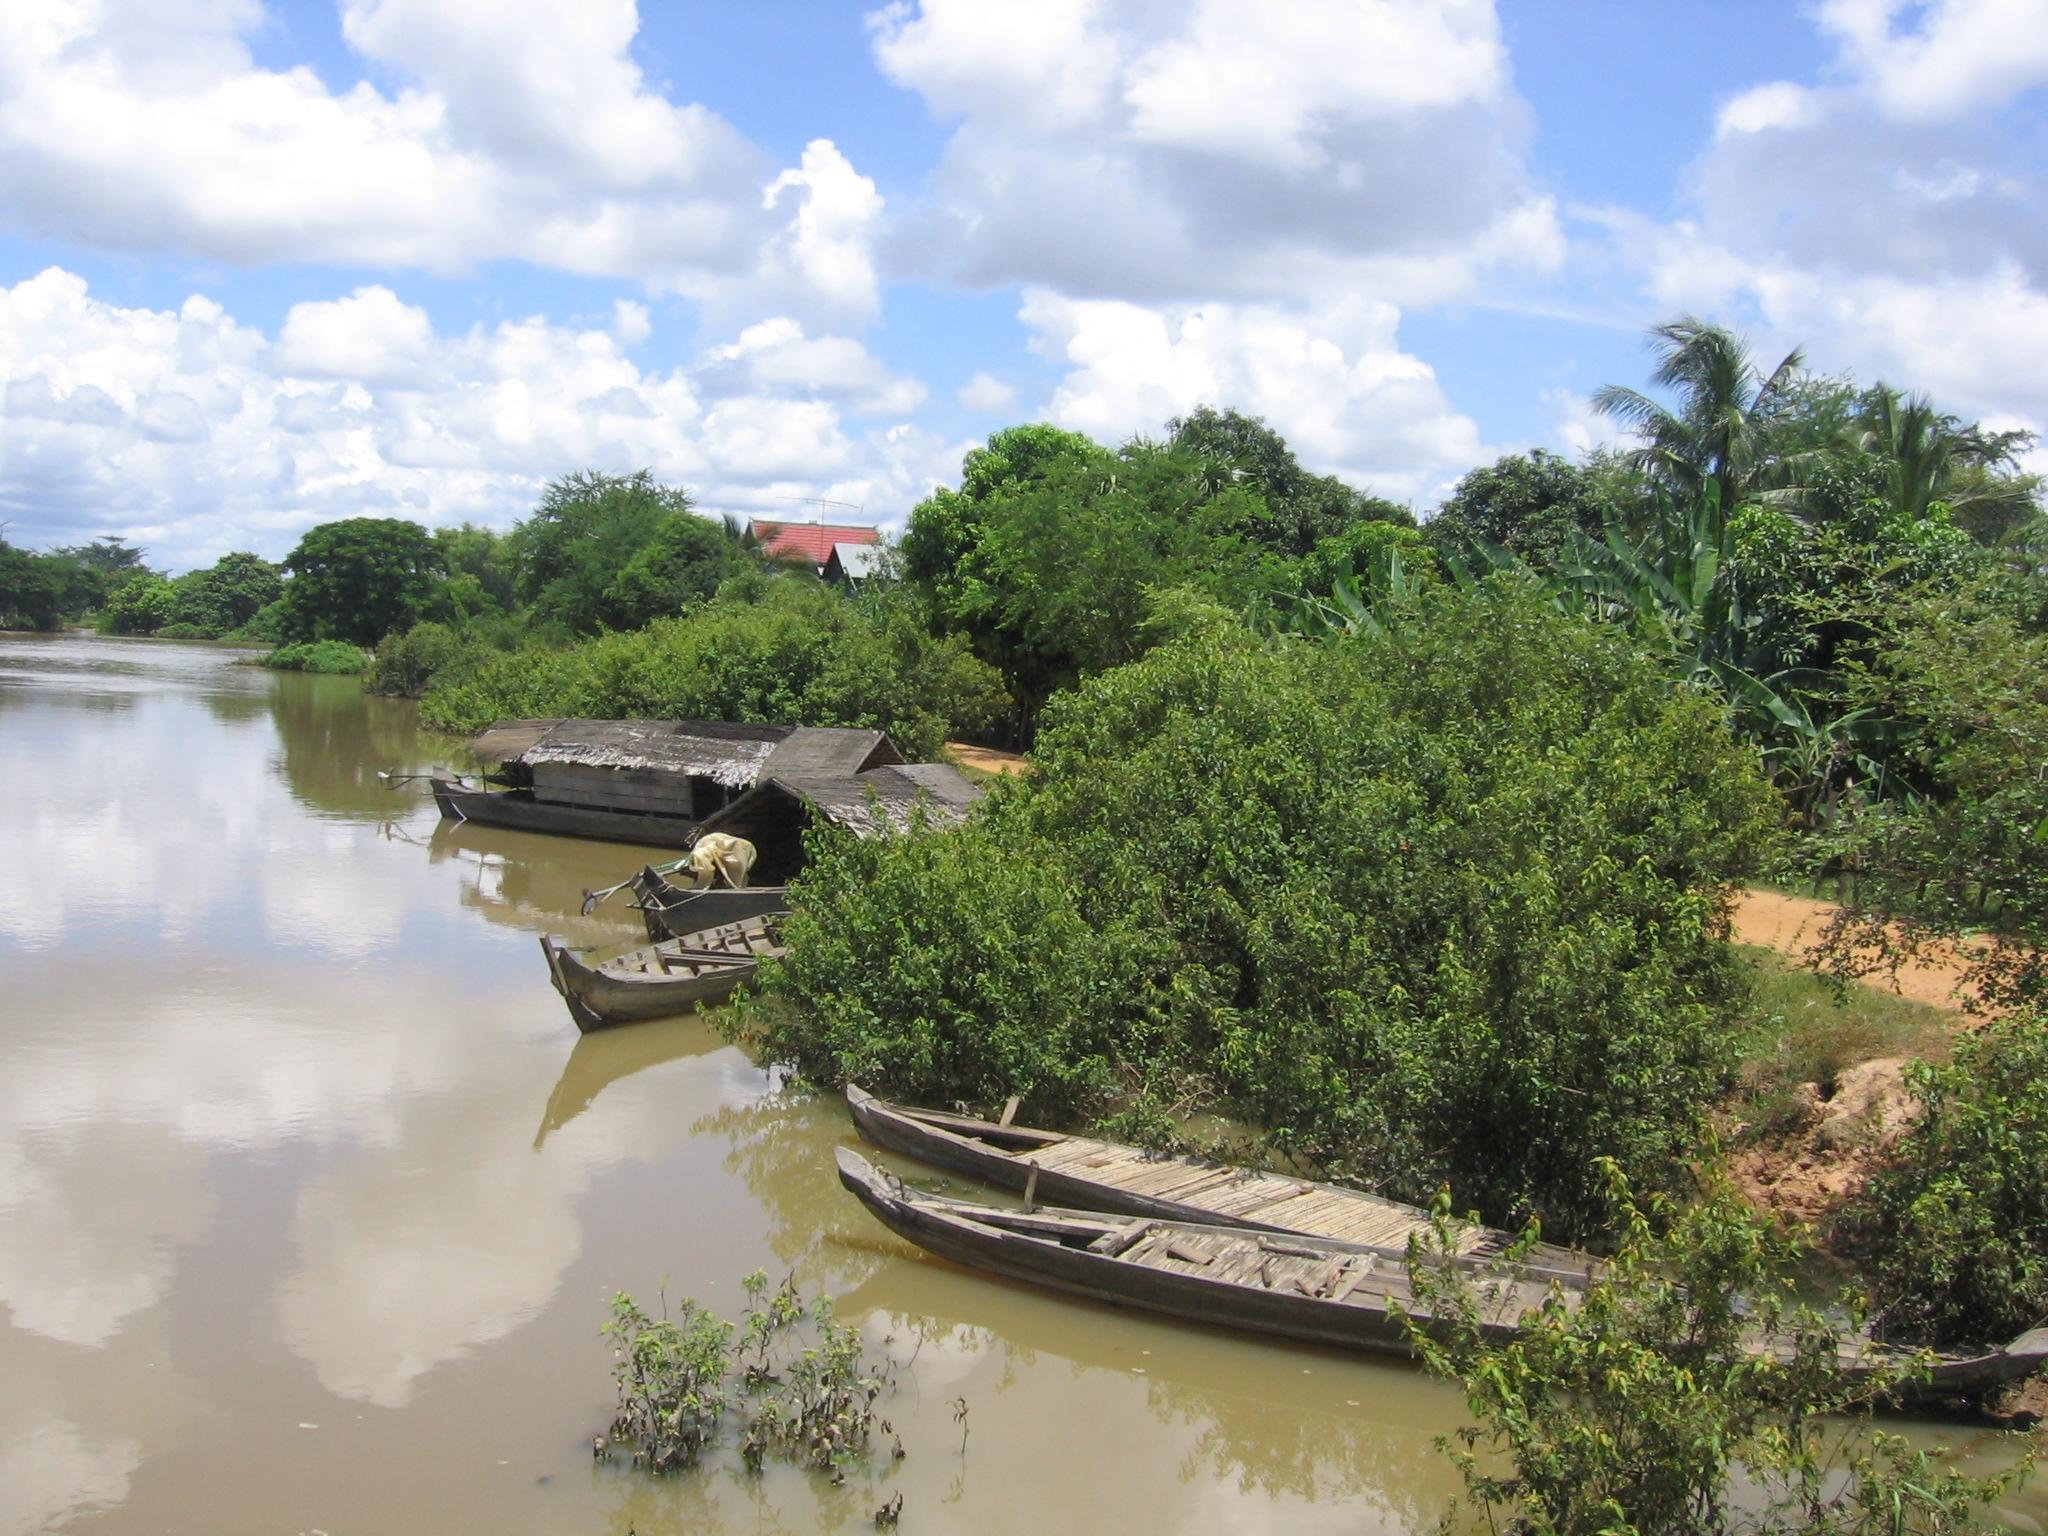 Prek Sbauv, birthplace of Pol Pot.